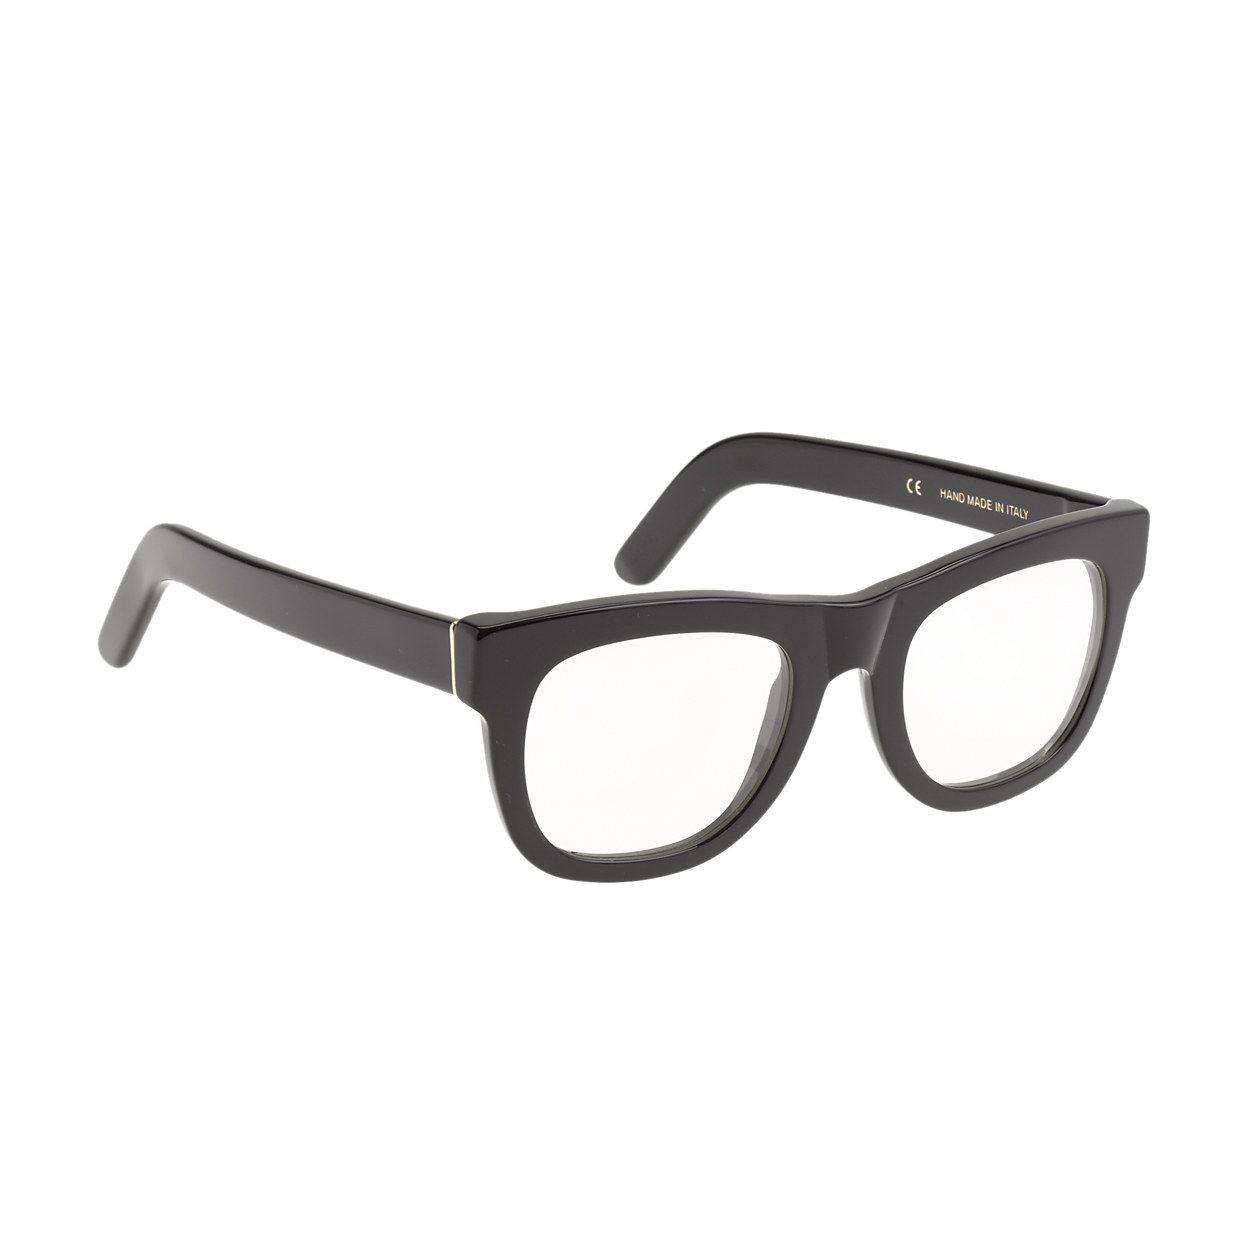 9e9129d0a900 Super™ Ciccio eyeglasses   eyewear